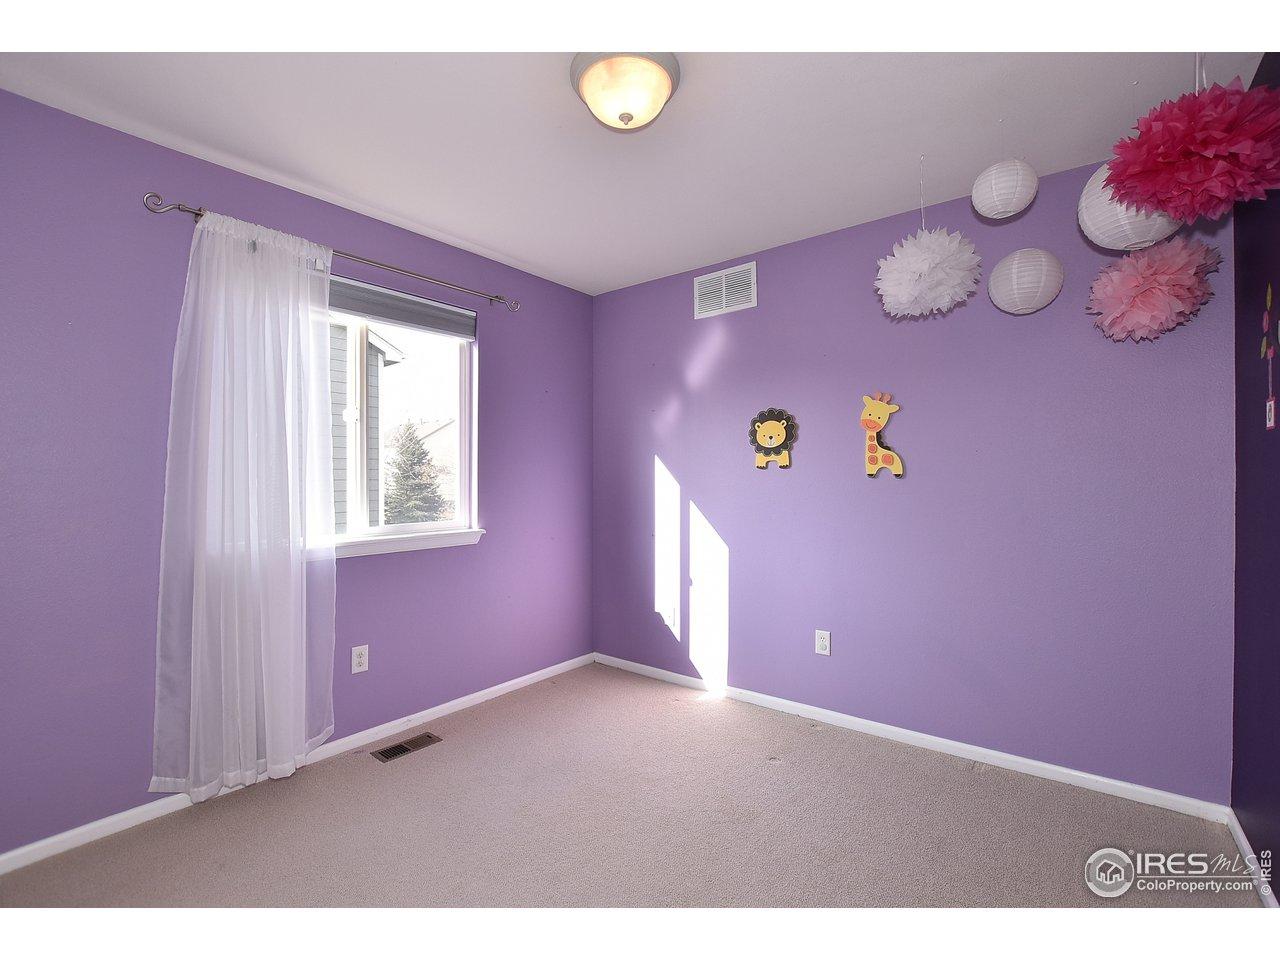 Adorable Bedroom 3